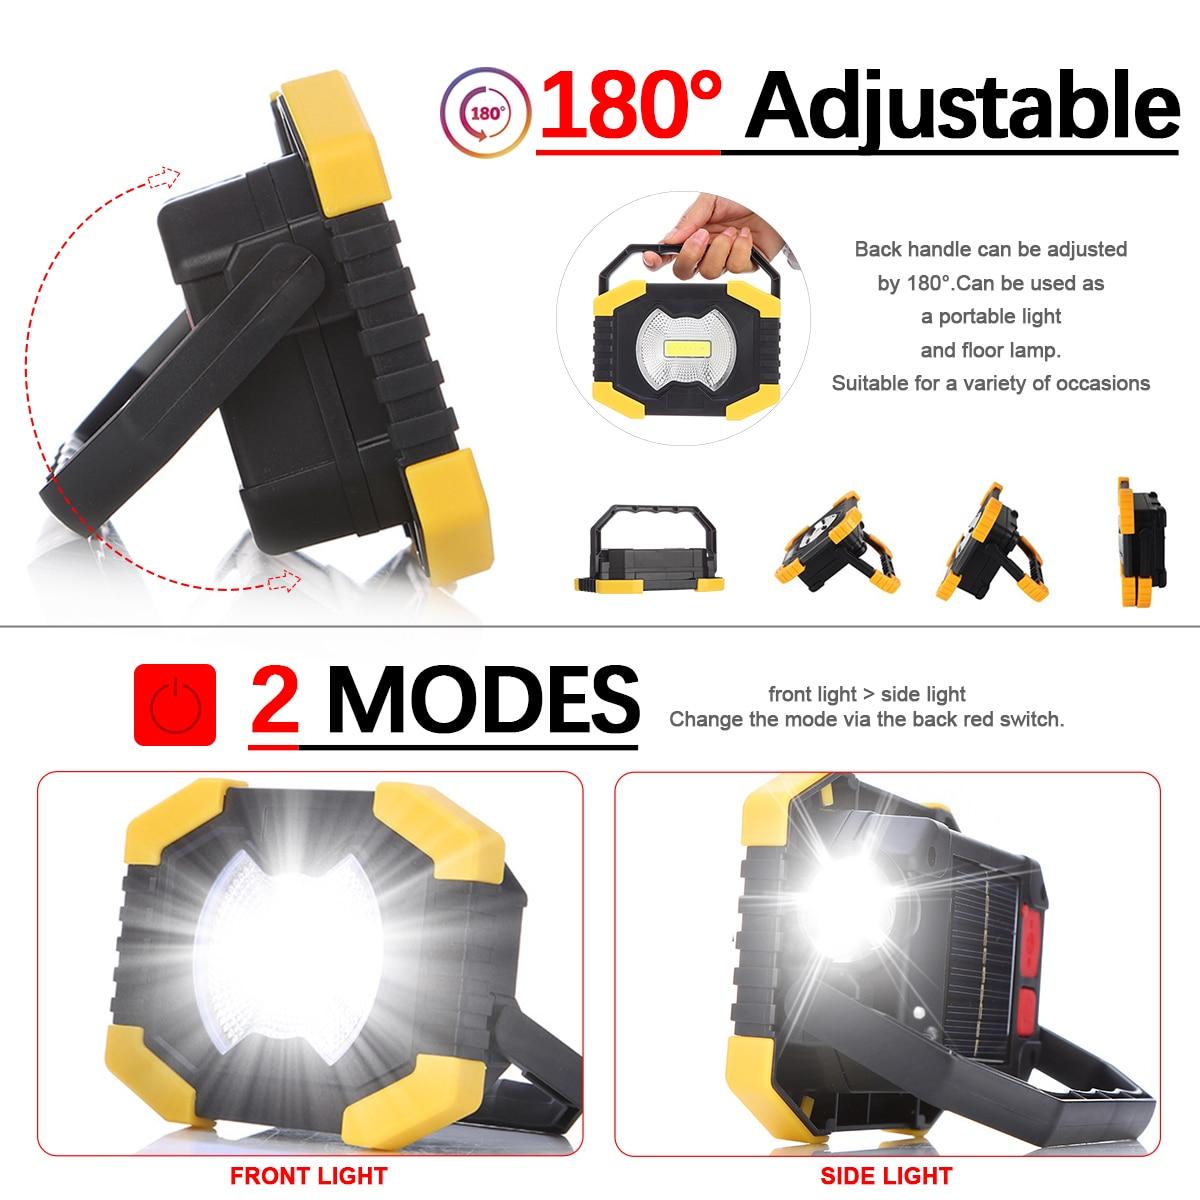 Foco recargable USB portátil linterna de trabajo linterna USB Lámpara de luz de energía Solar batería incorporada de 2400mAh para Camping Reflector LED de carga USB Luz de trabajo reflector recargable 2*18650 o 4 * AA batería al aire libre reflector para Camping emergencia